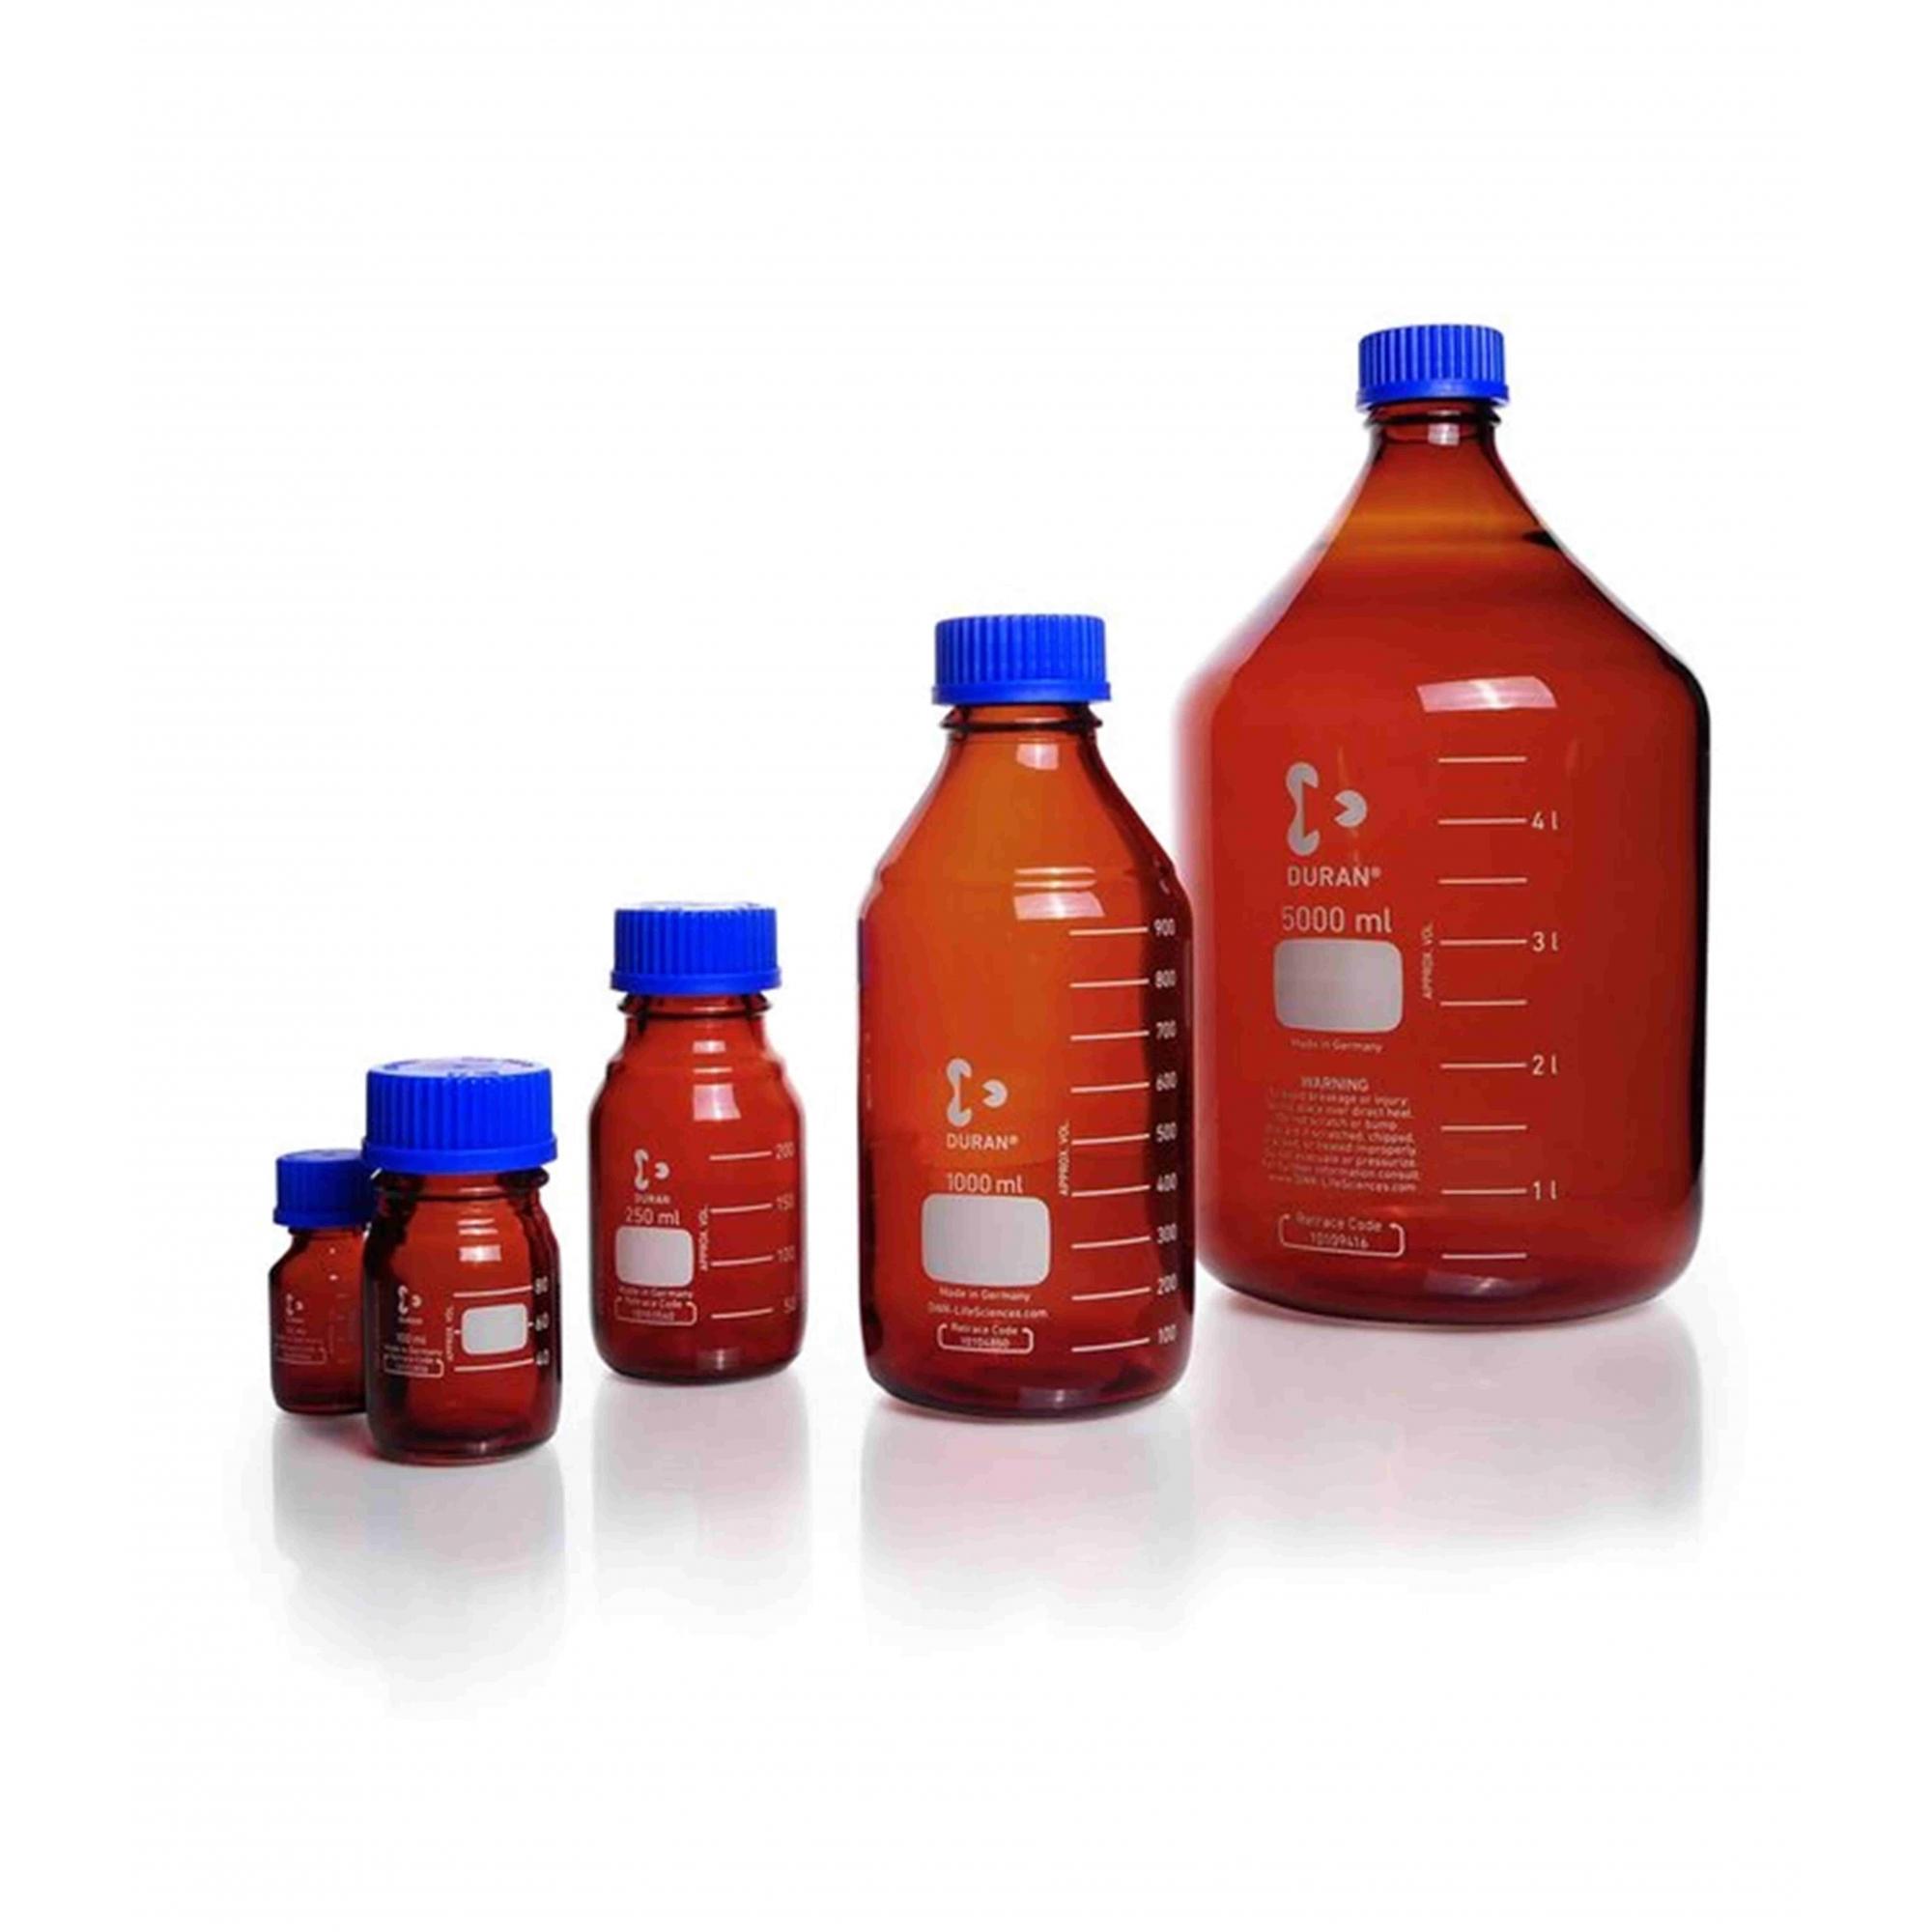 Frasco Reagente Âmbar Tampa Azul 1000 ml - Schott - Cód. 21806545